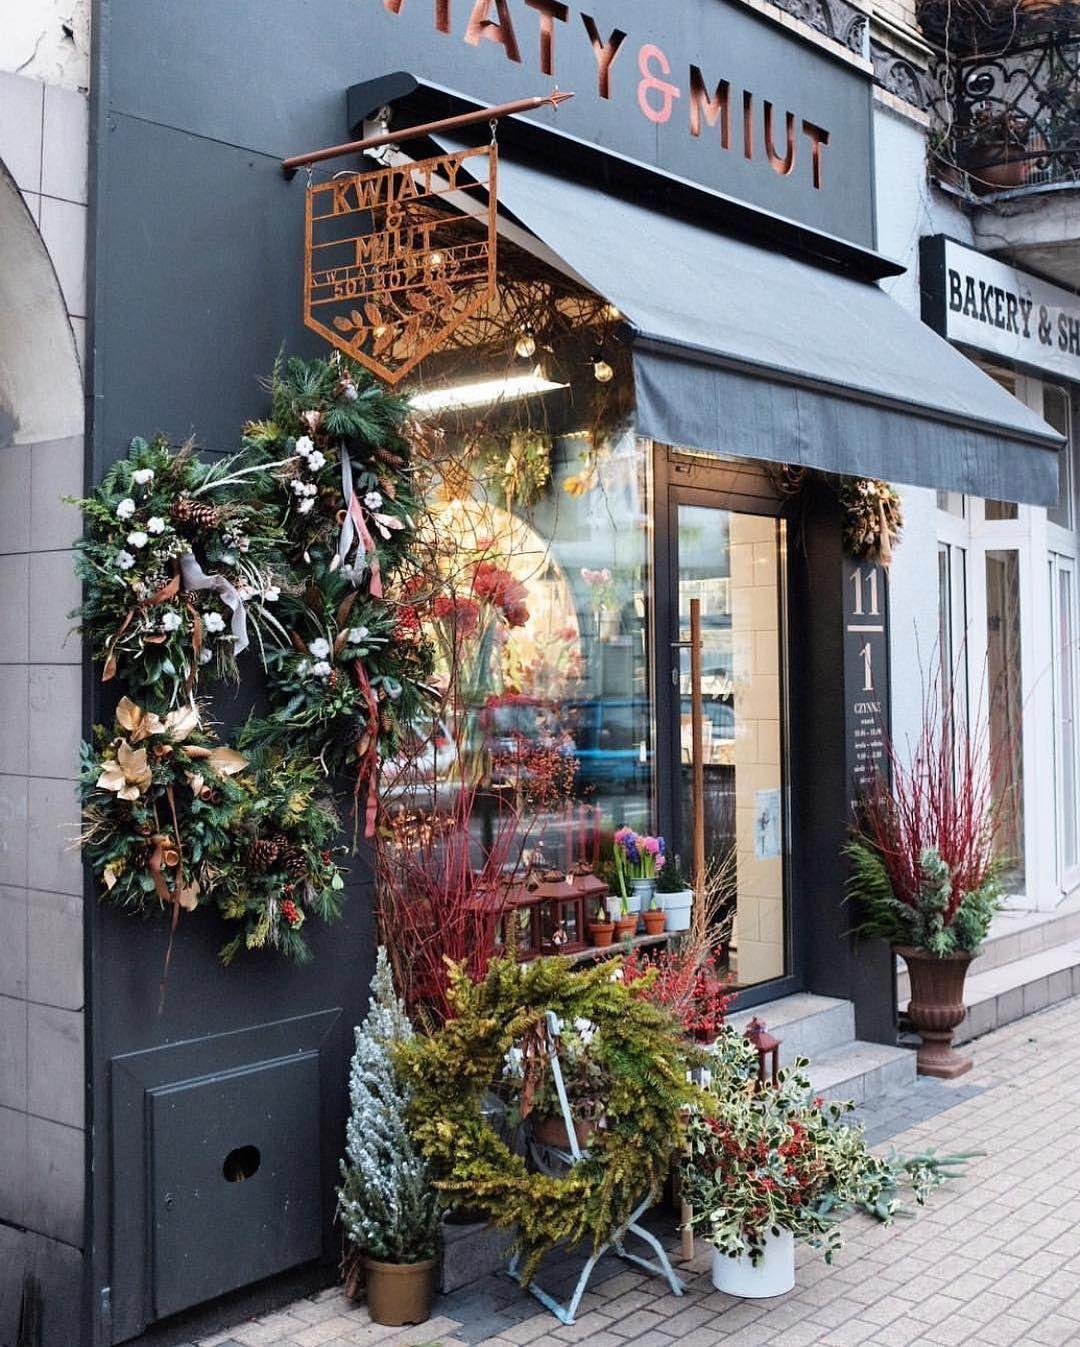 The Flower Shopkeepers On Instagram Pretty Seasonal Florals Decorate Kwiaty Miut Shopfront In Poznan Kwiatyimiut Poznan Floral Shop Shop Signs Decor